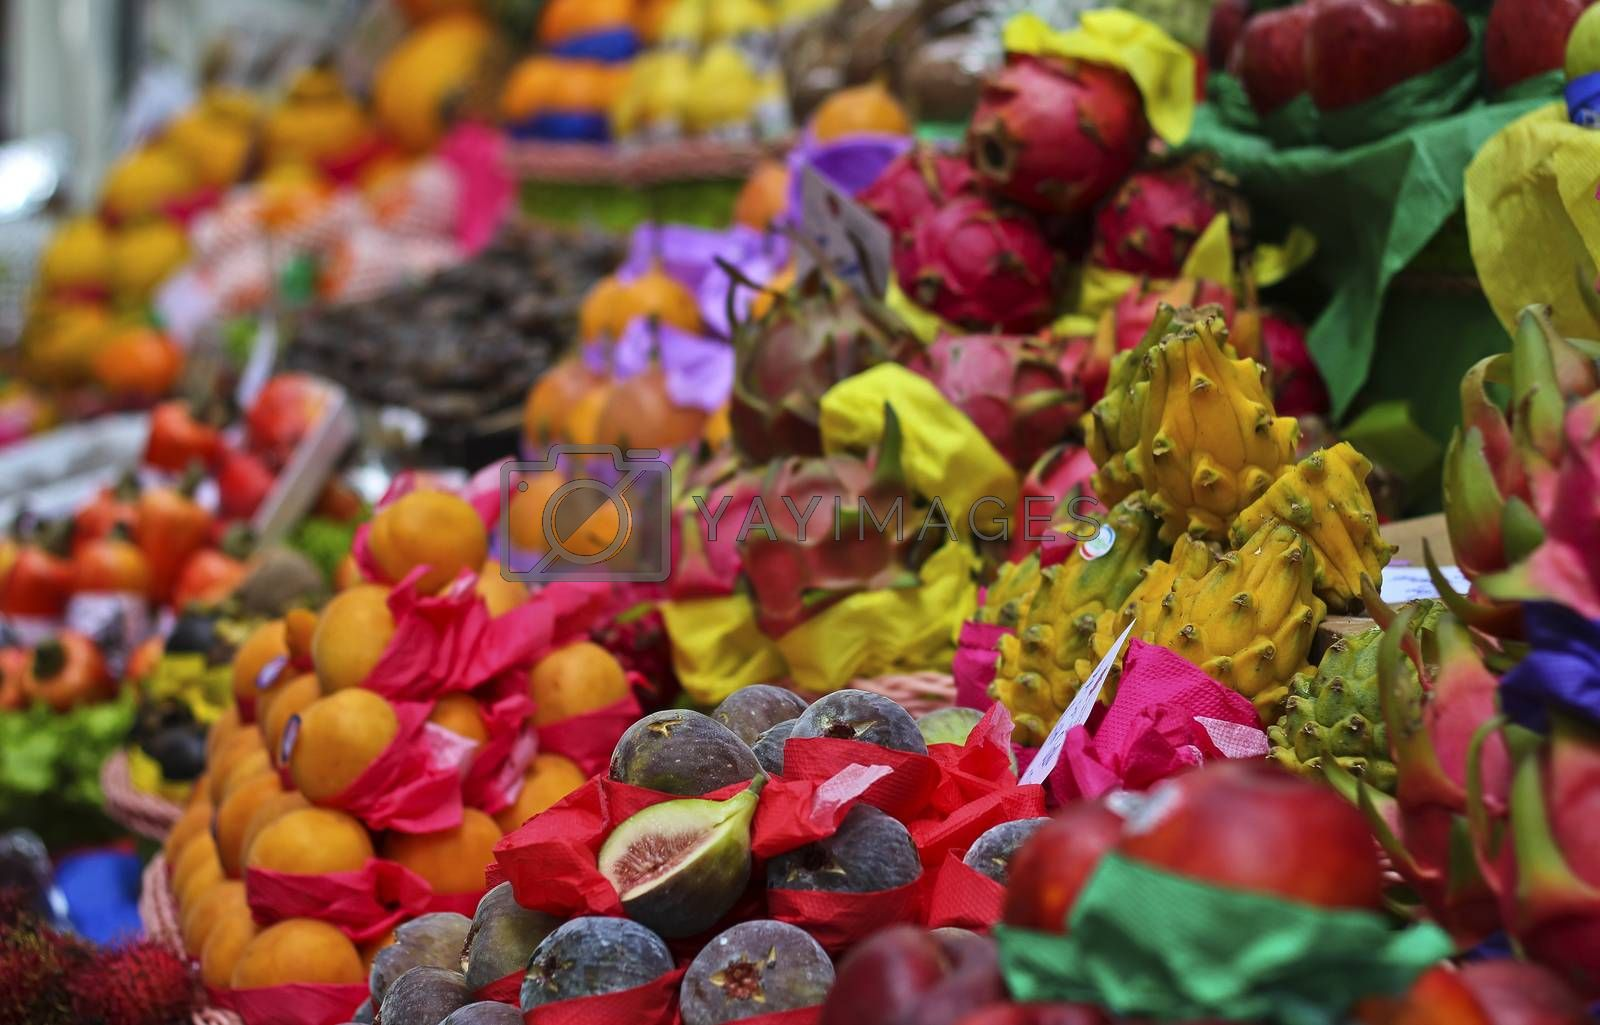 Tropical fruit vendor at Sao Paulo Central Market